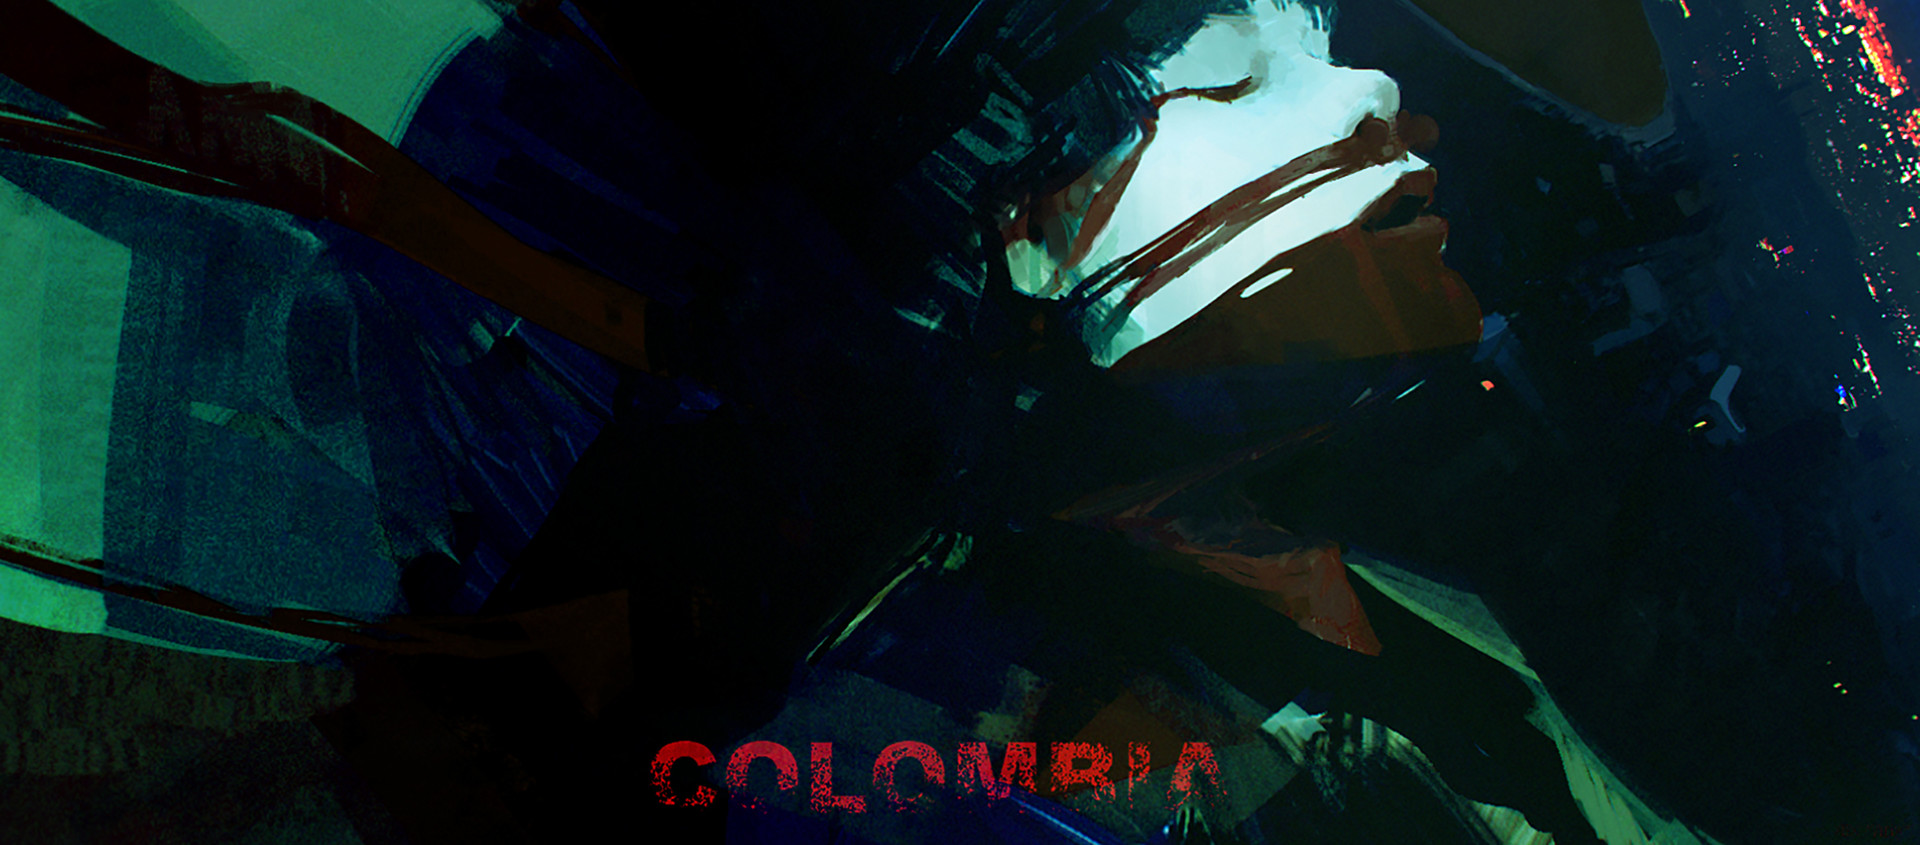 Alexander mandradjiev colombia 3